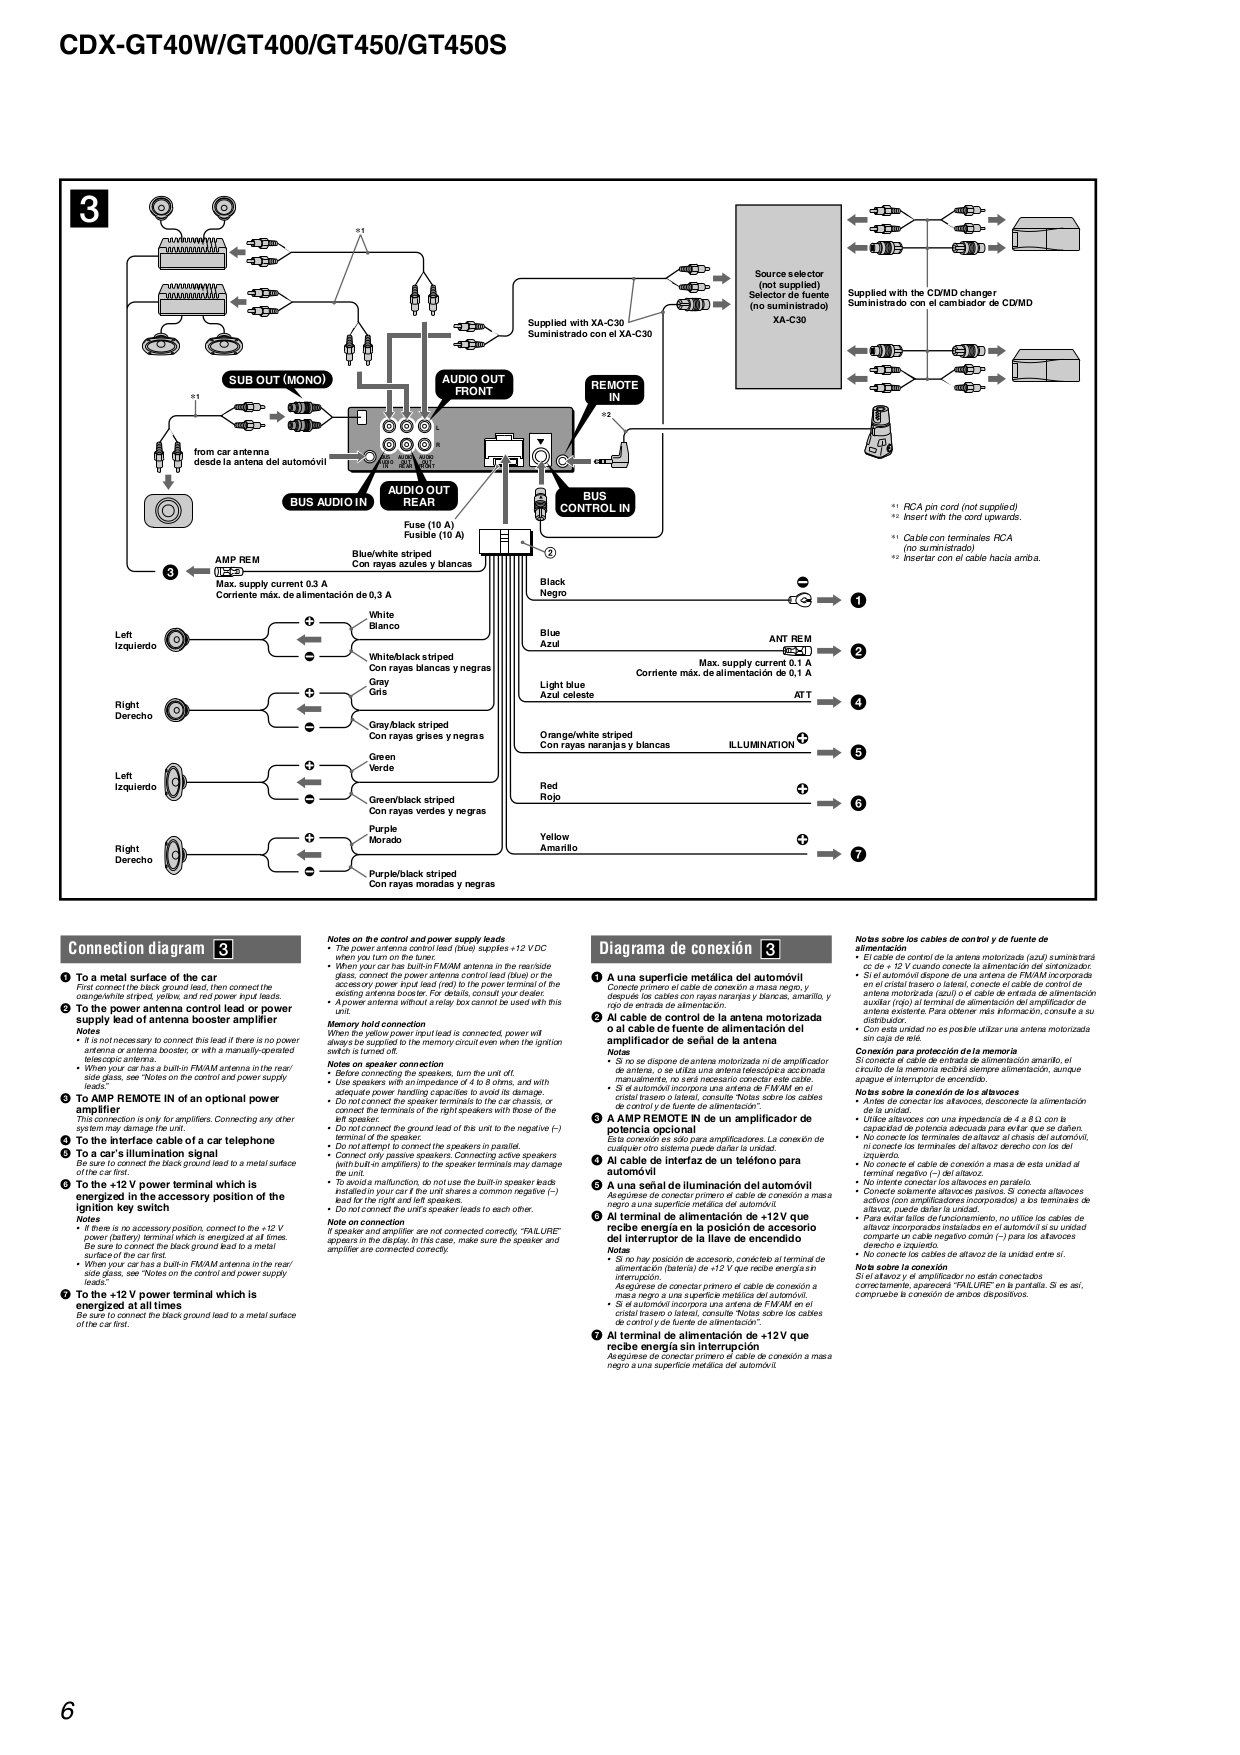 diagram] sony cdx gt40w wiring diagram full version hd quality wiring  diagram - humanbraindiagrams.blidetoine.fr  humanbraindiagrams.blidetoine.fr